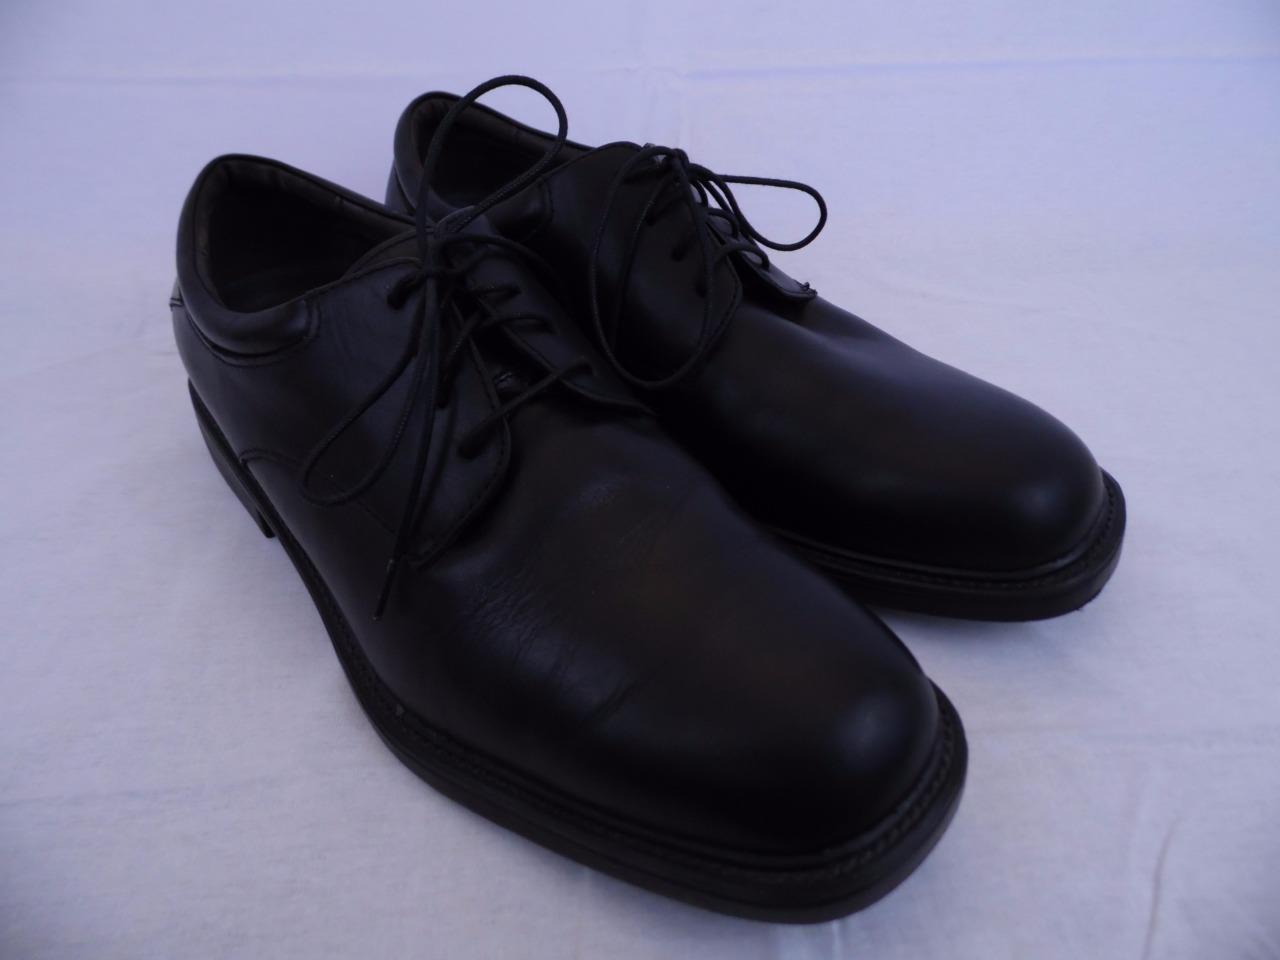 NUNN BUSH Dress Shoes Men Black Leather Size 10.5 Mens Oxford Comfort Gel Shoe